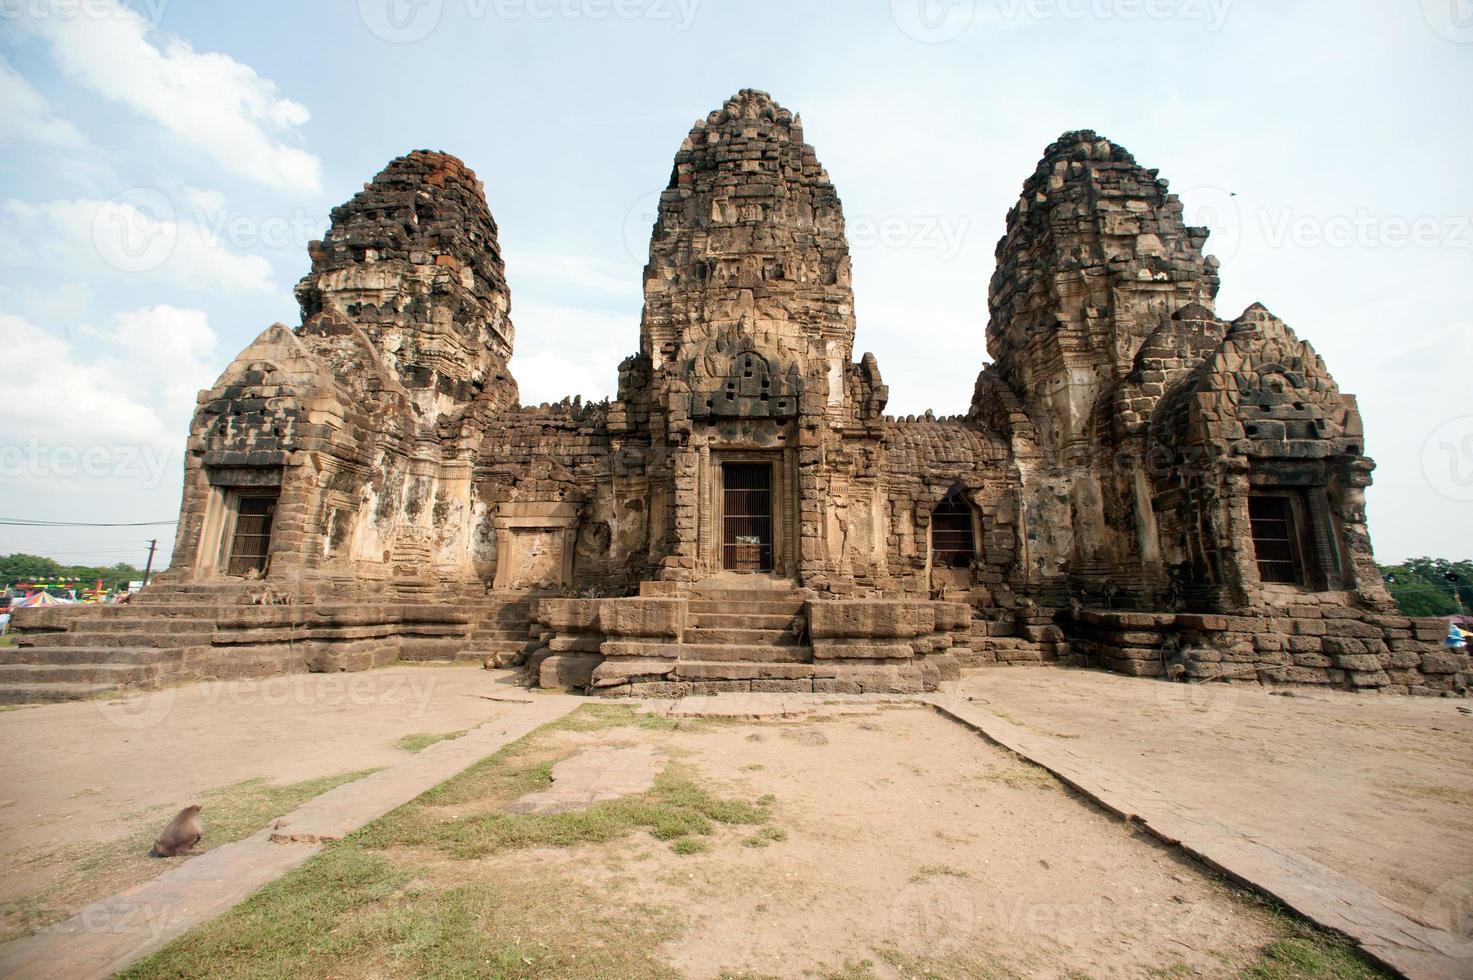 Temple de Phra Prang Sam Yod en Thaïlande. photo